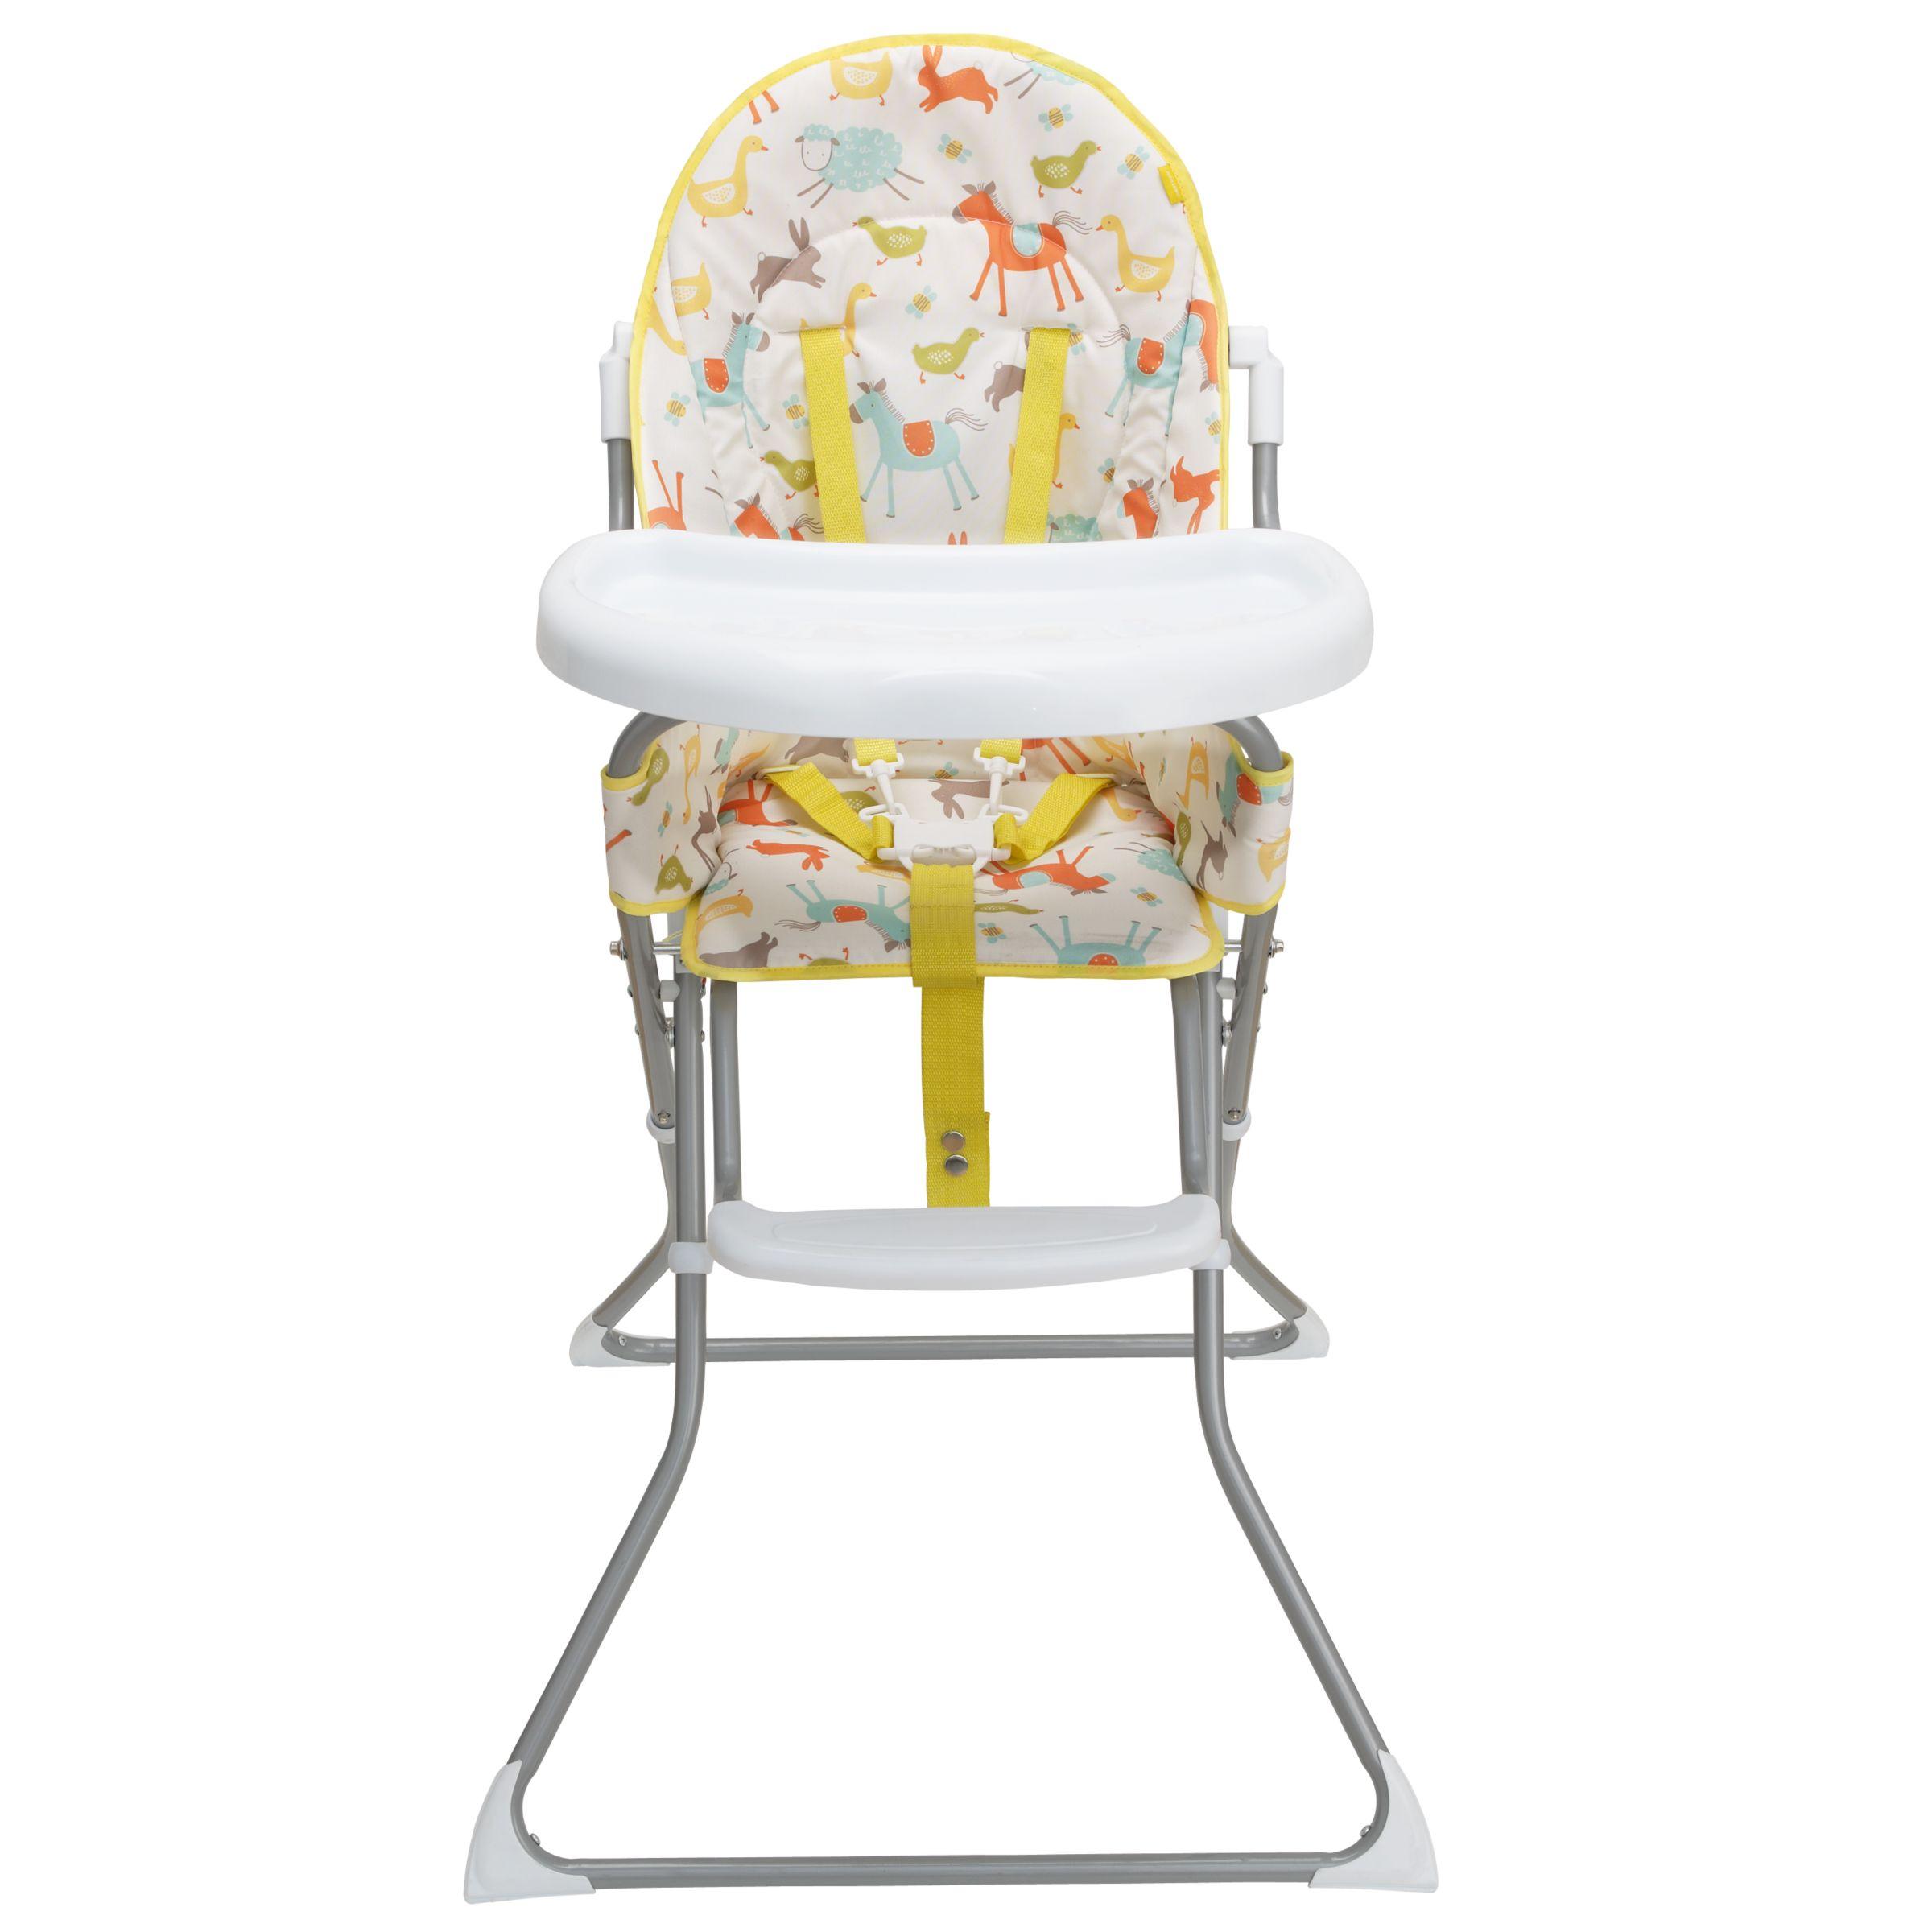 Baby Bibs Baby Bottles Breast Feeding Highchairs & Boosters